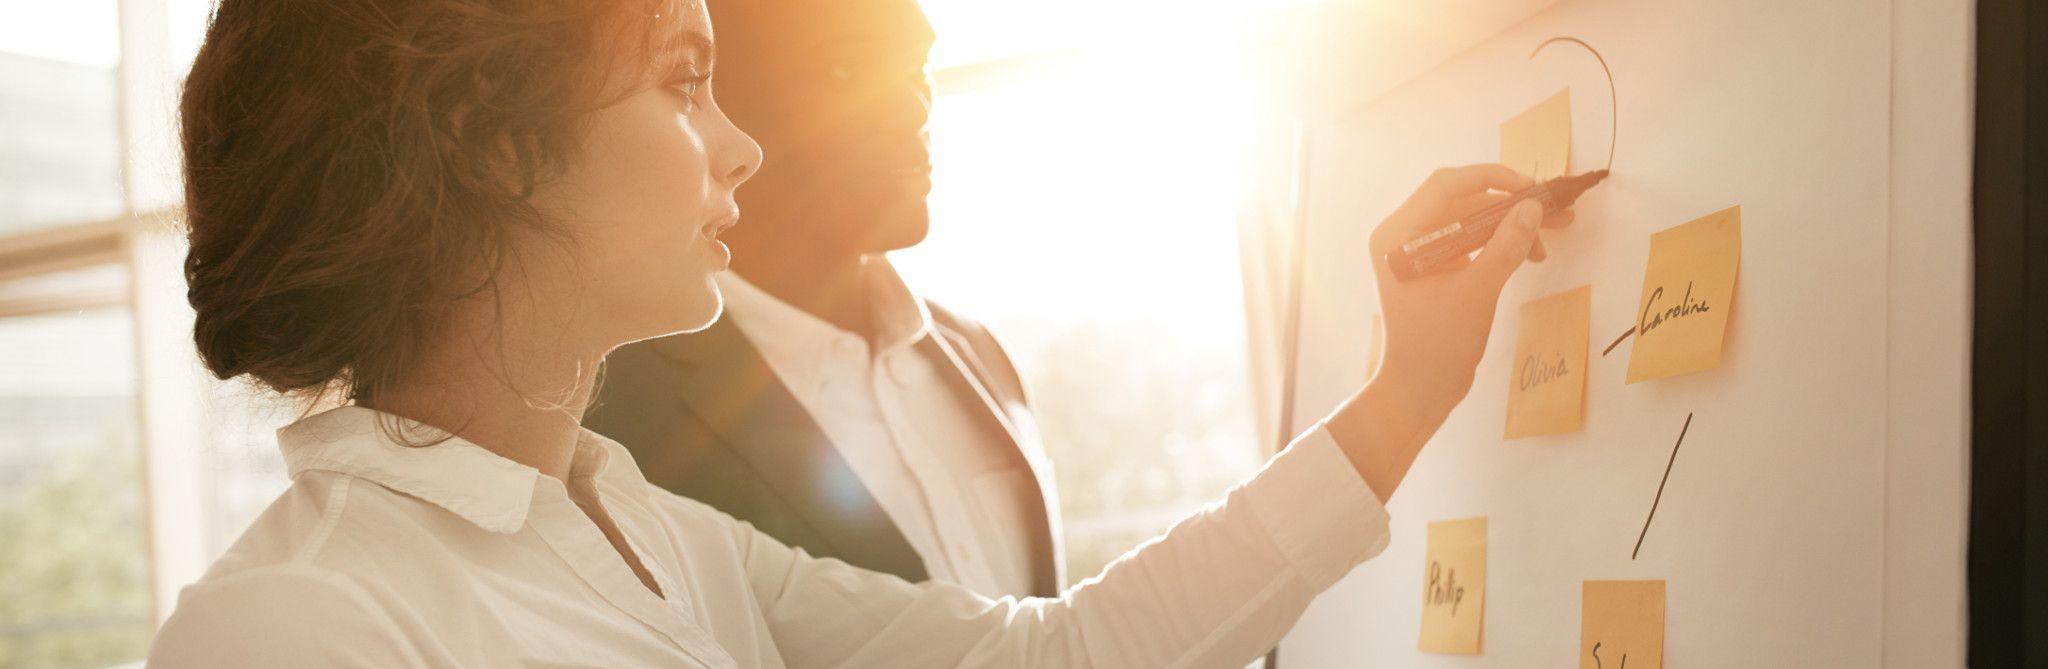 Justifying a Digital Asset Management Investment